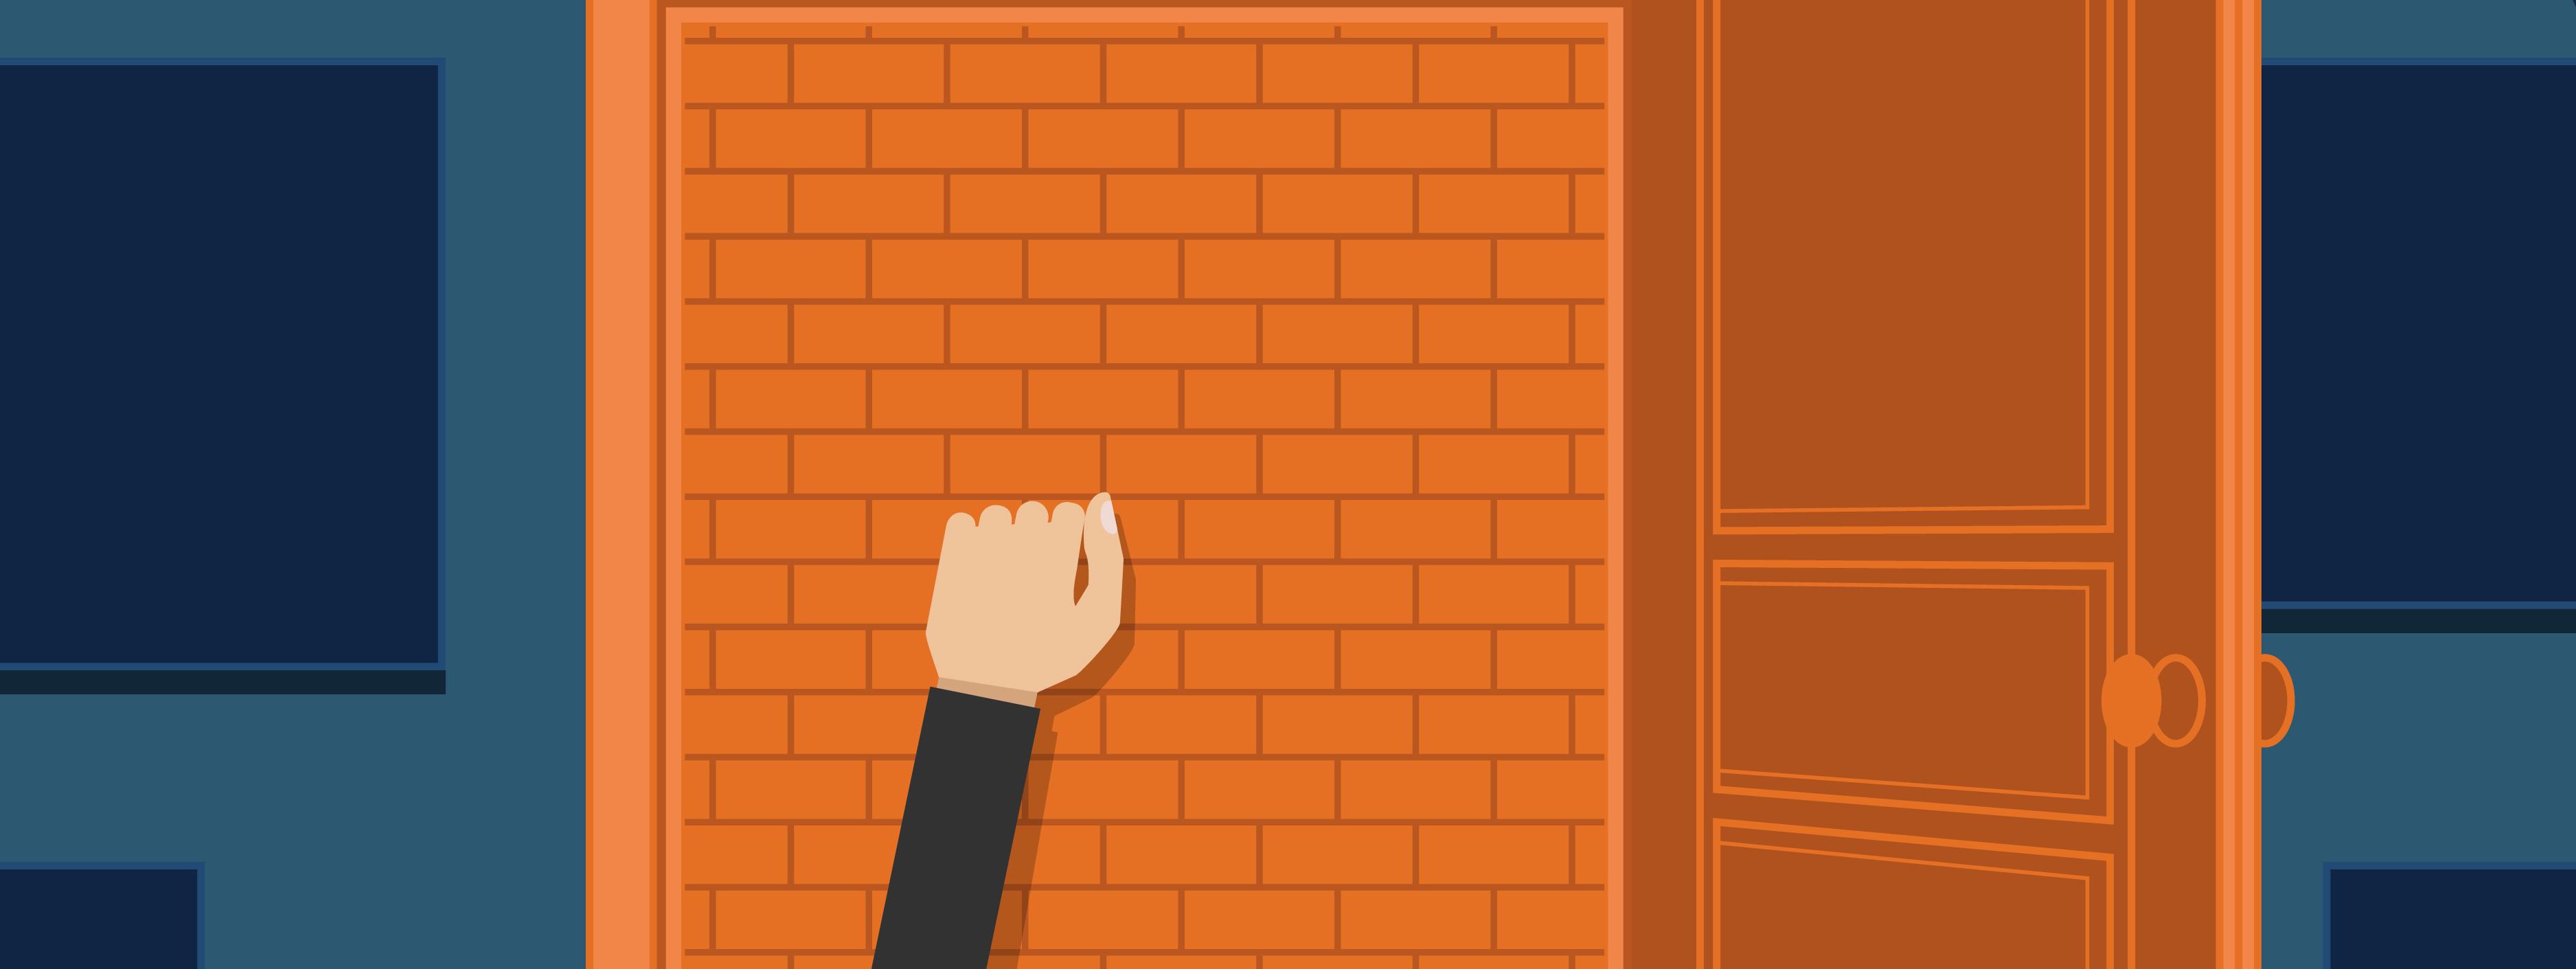 Block, Block, Blocking on DBAs Door with SQL Server Blocking